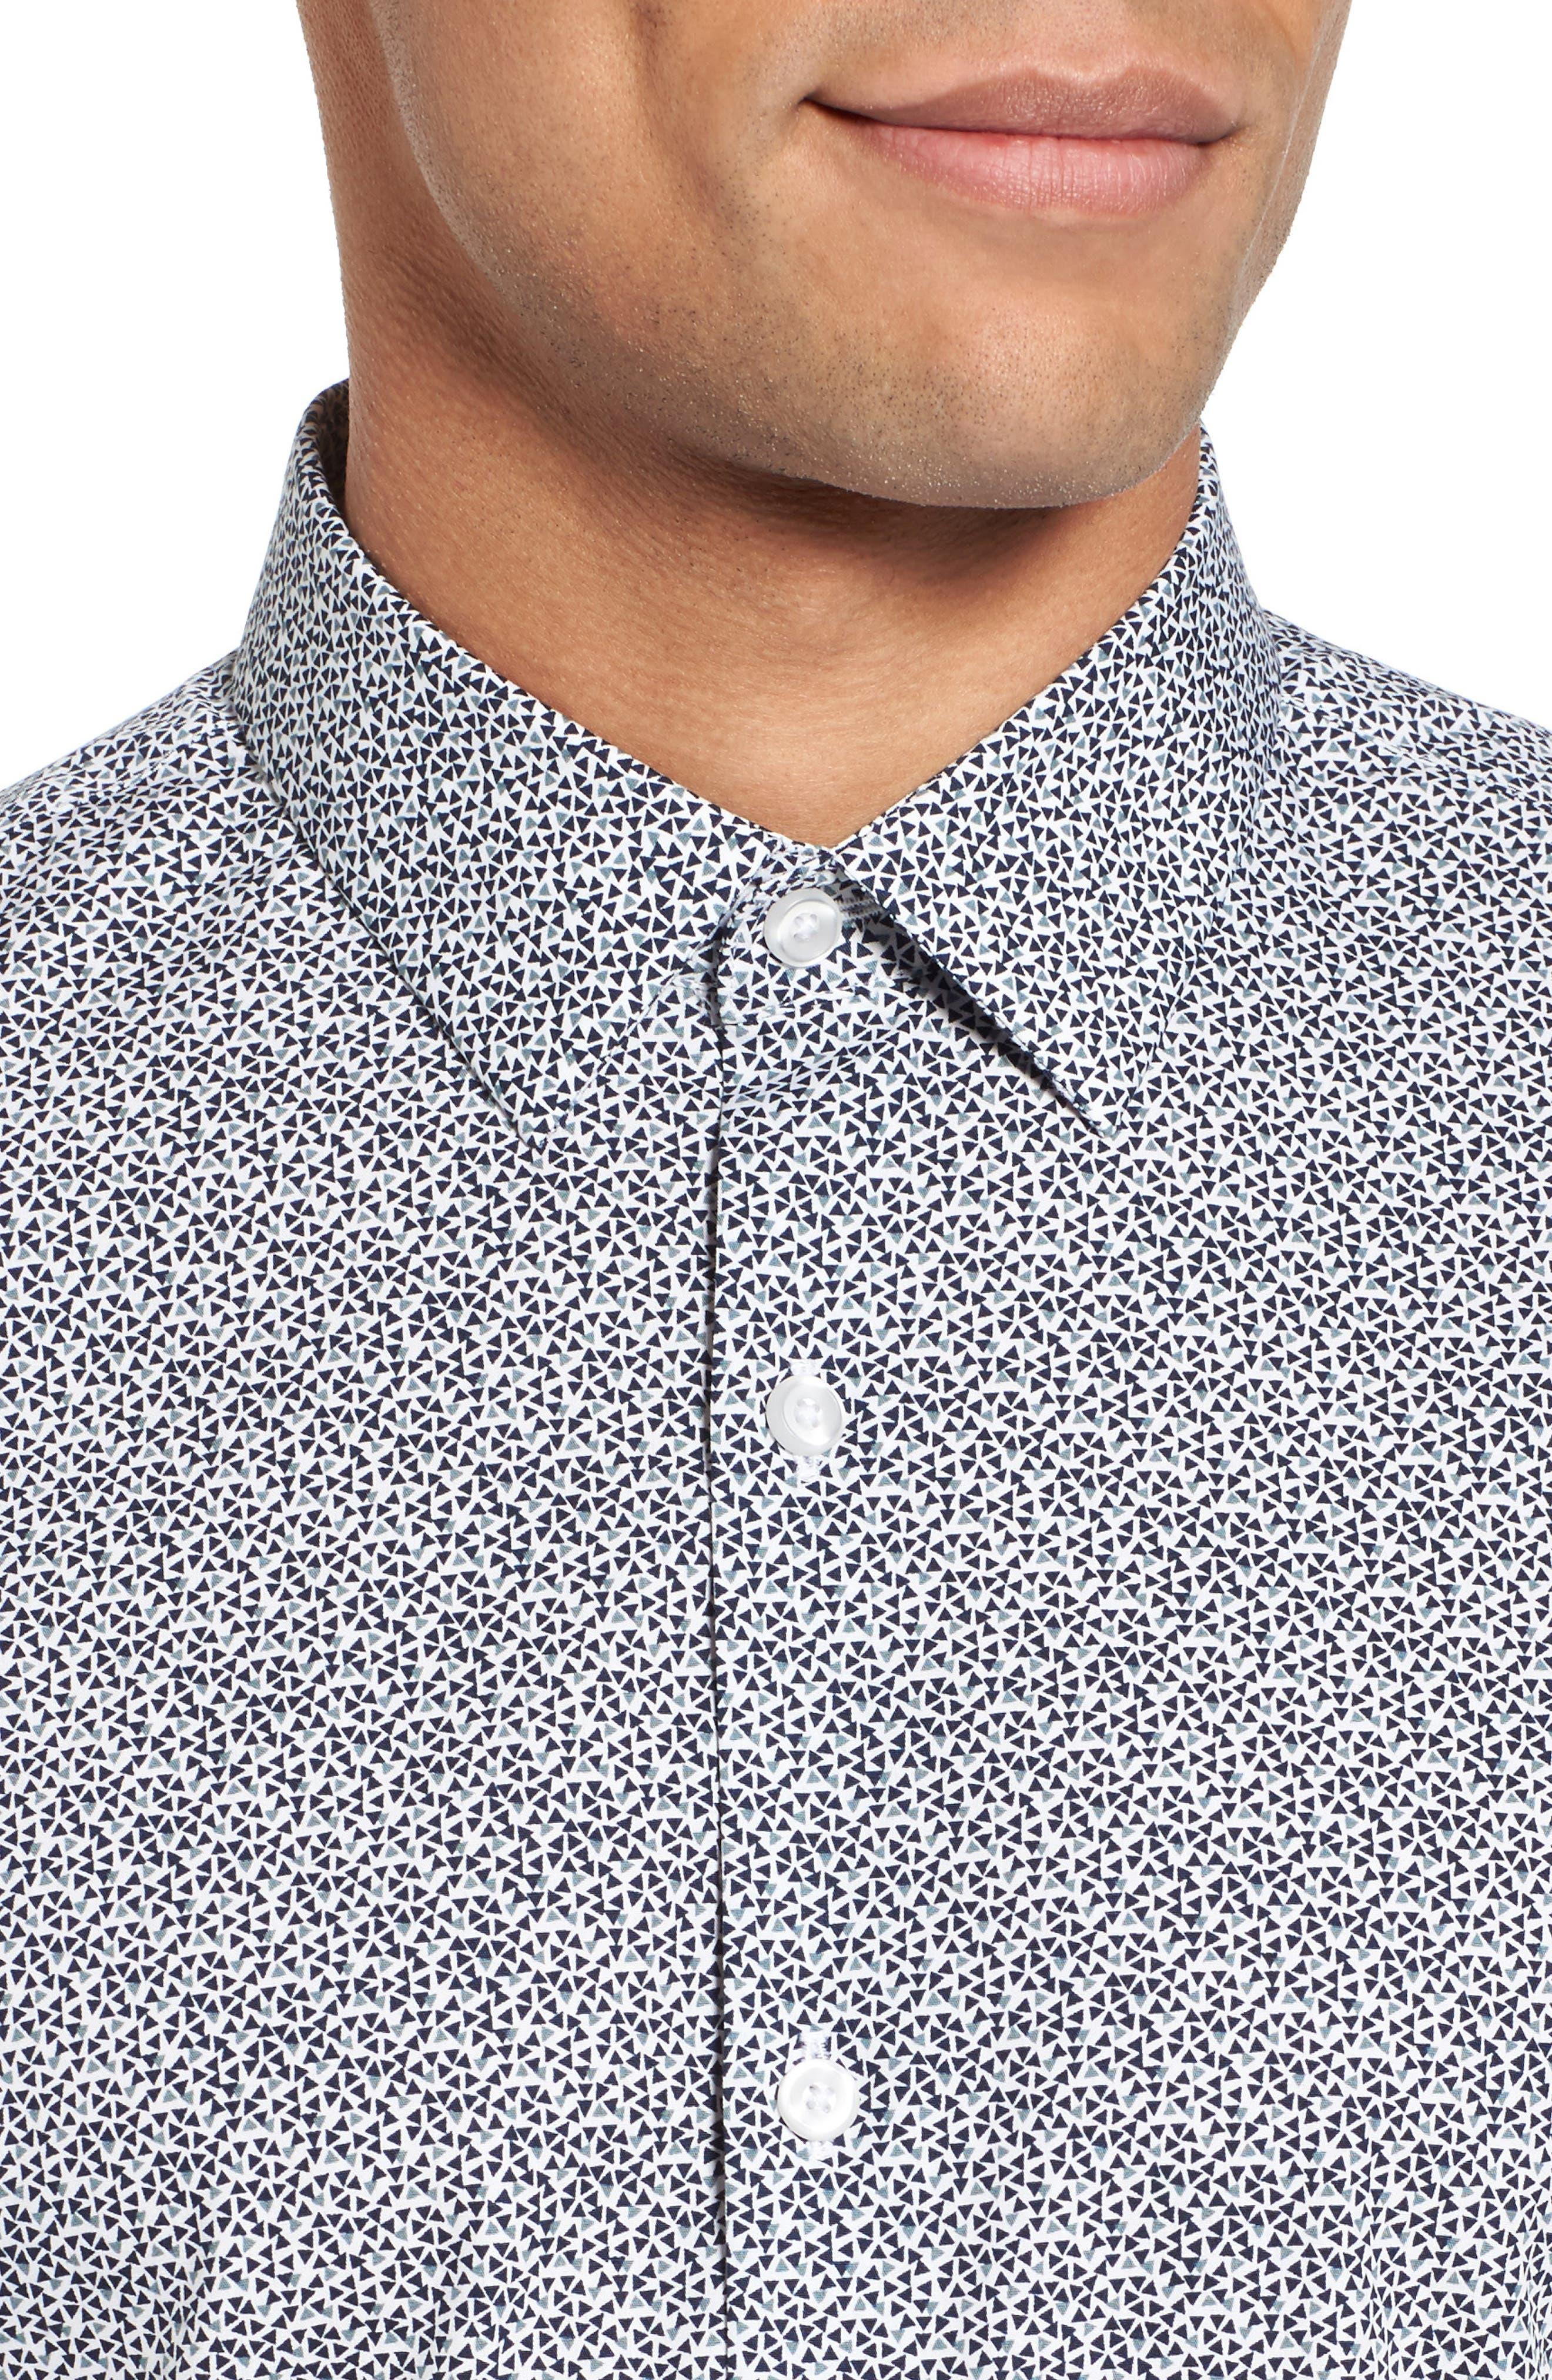 Trim Fit Geometric Sport Shirt,                             Alternate thumbnail 2, color,                             Navy Blue Scatter Triangles